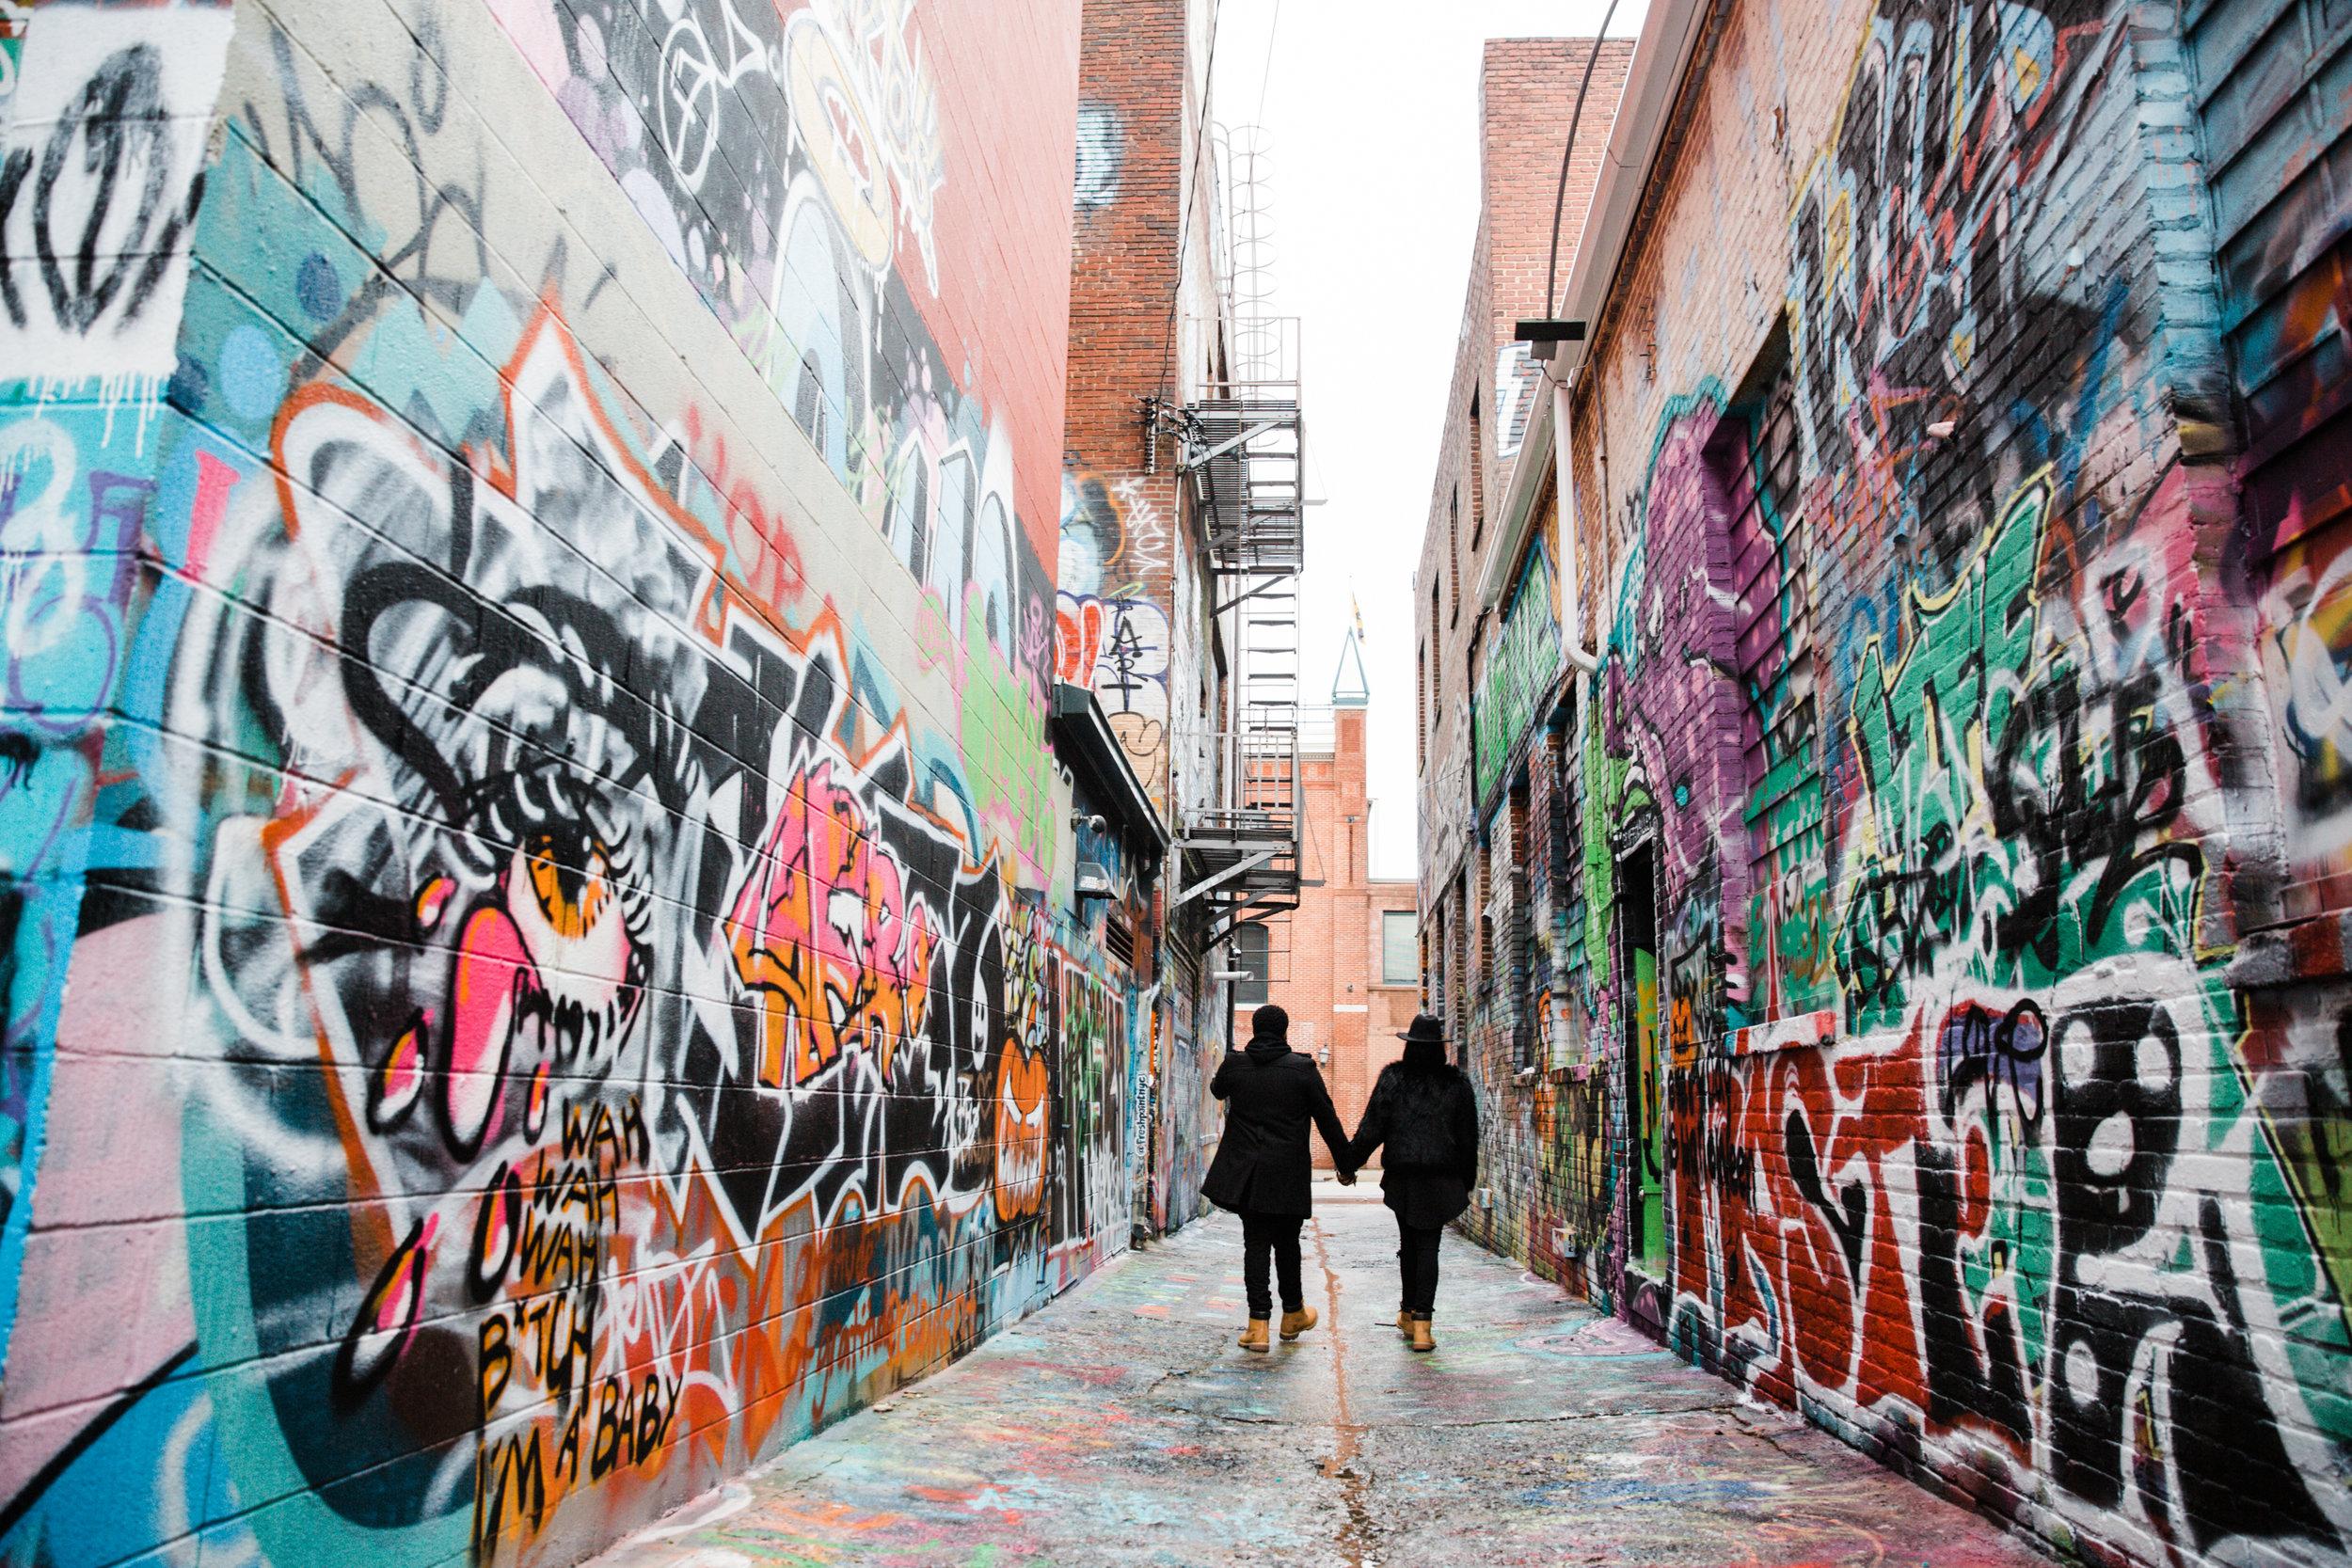 Creative Baltimore Graffiti Alley Engagement Session Megapixels Media Photography-53.jpg